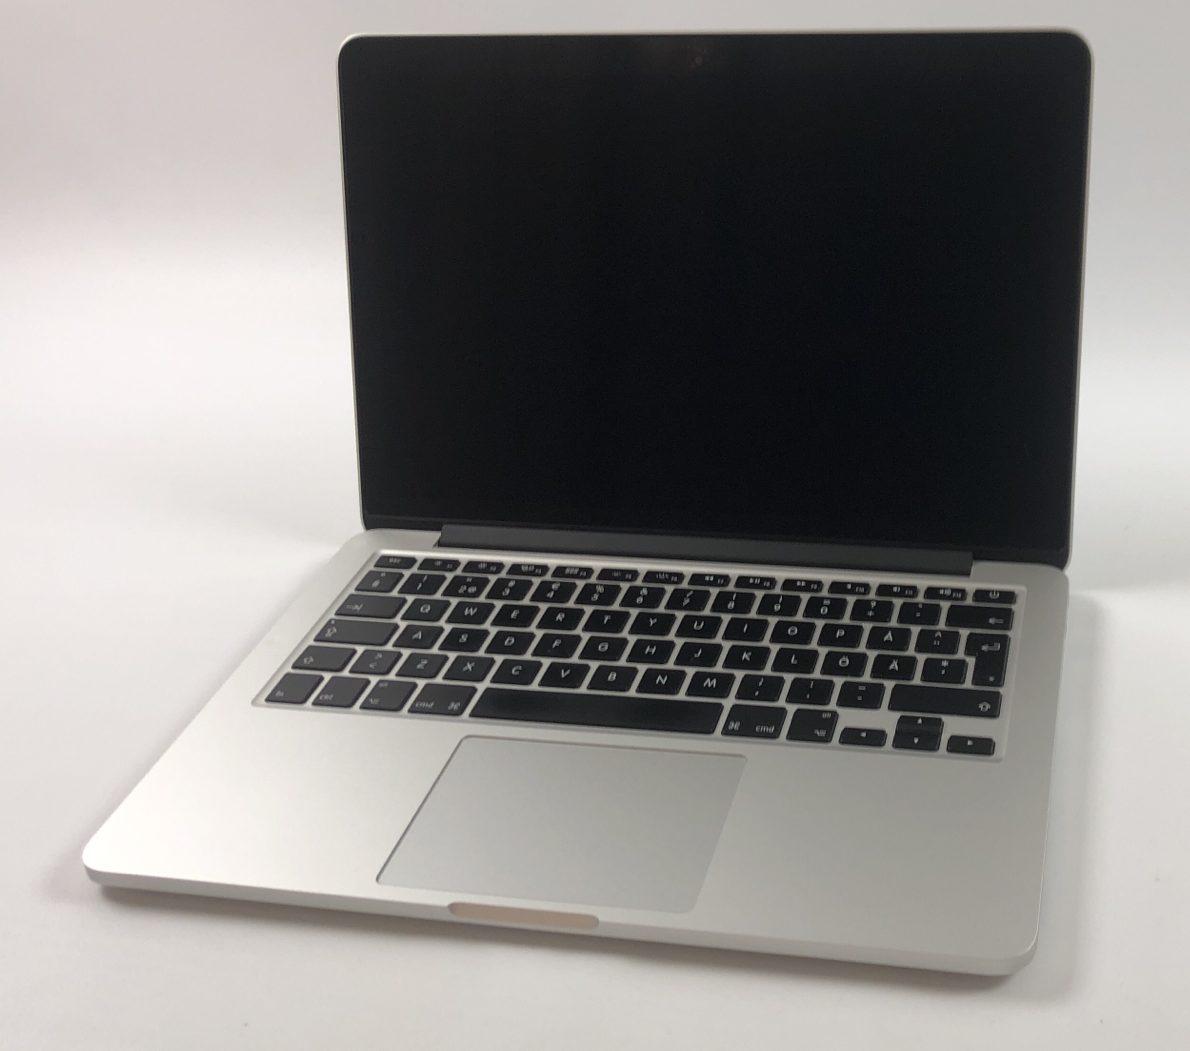 "MacBook Pro Retina 13"" Mid 2014 (Intel Core i5 2.6 GHz 8 GB RAM 256 GB SSD), Intel Core i5 2.6 GHz, 8 GB RAM, 256 GB SSD, Kuva 1"